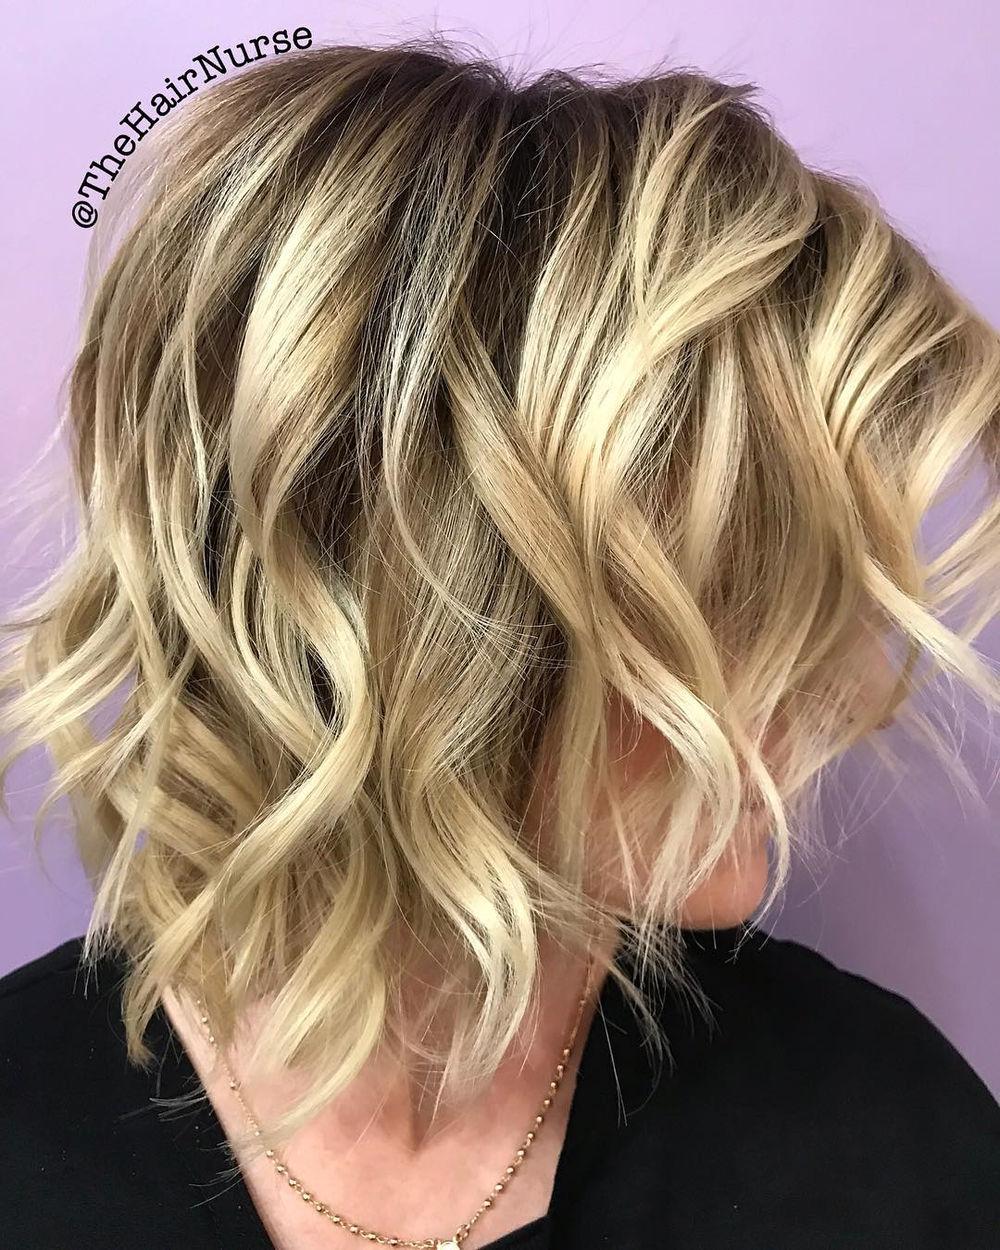 50 Bomb Wavy Bob Haircuts For The Current Season Hair Adviser